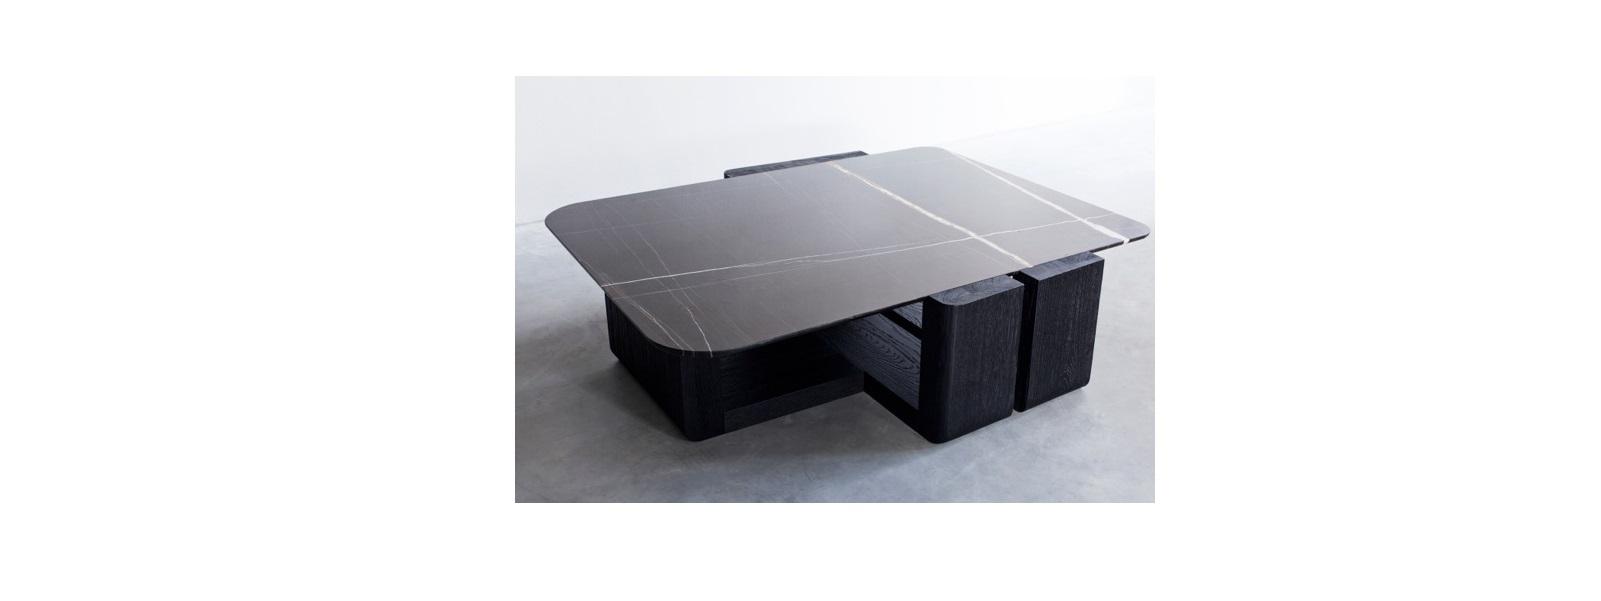 Kitale cocktail table (9) klein.jpg